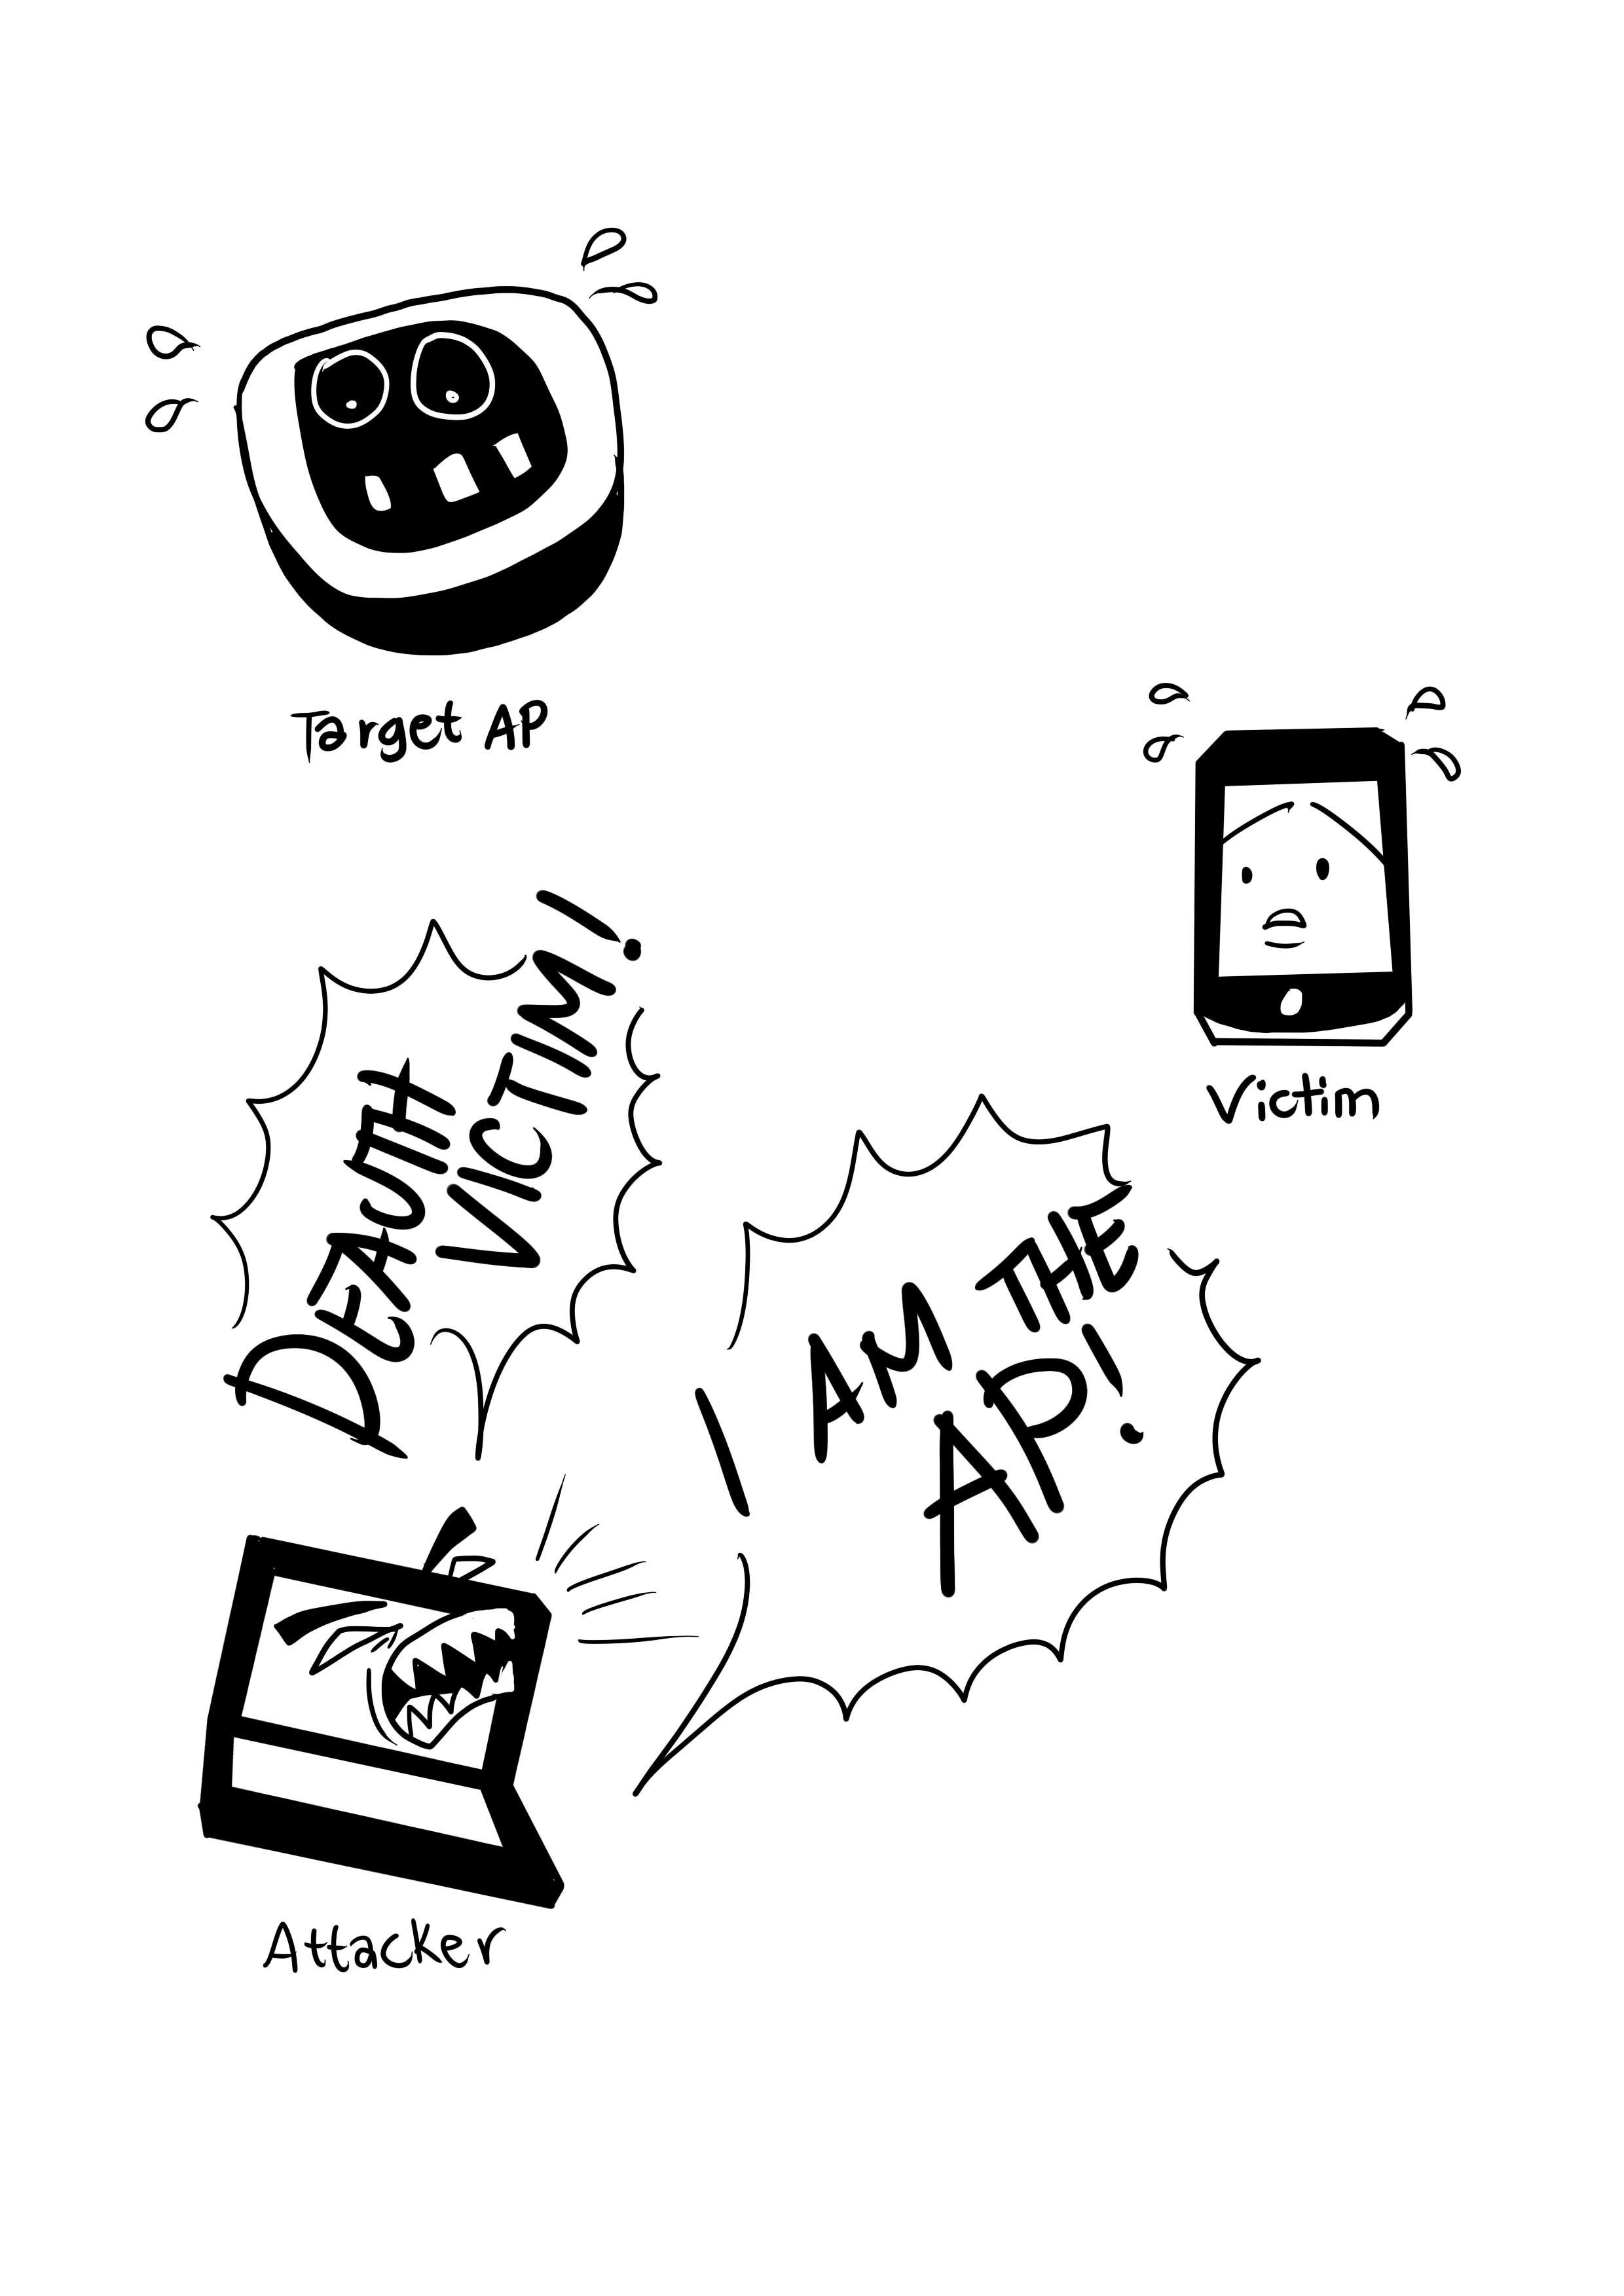 mitm-attack-wifi